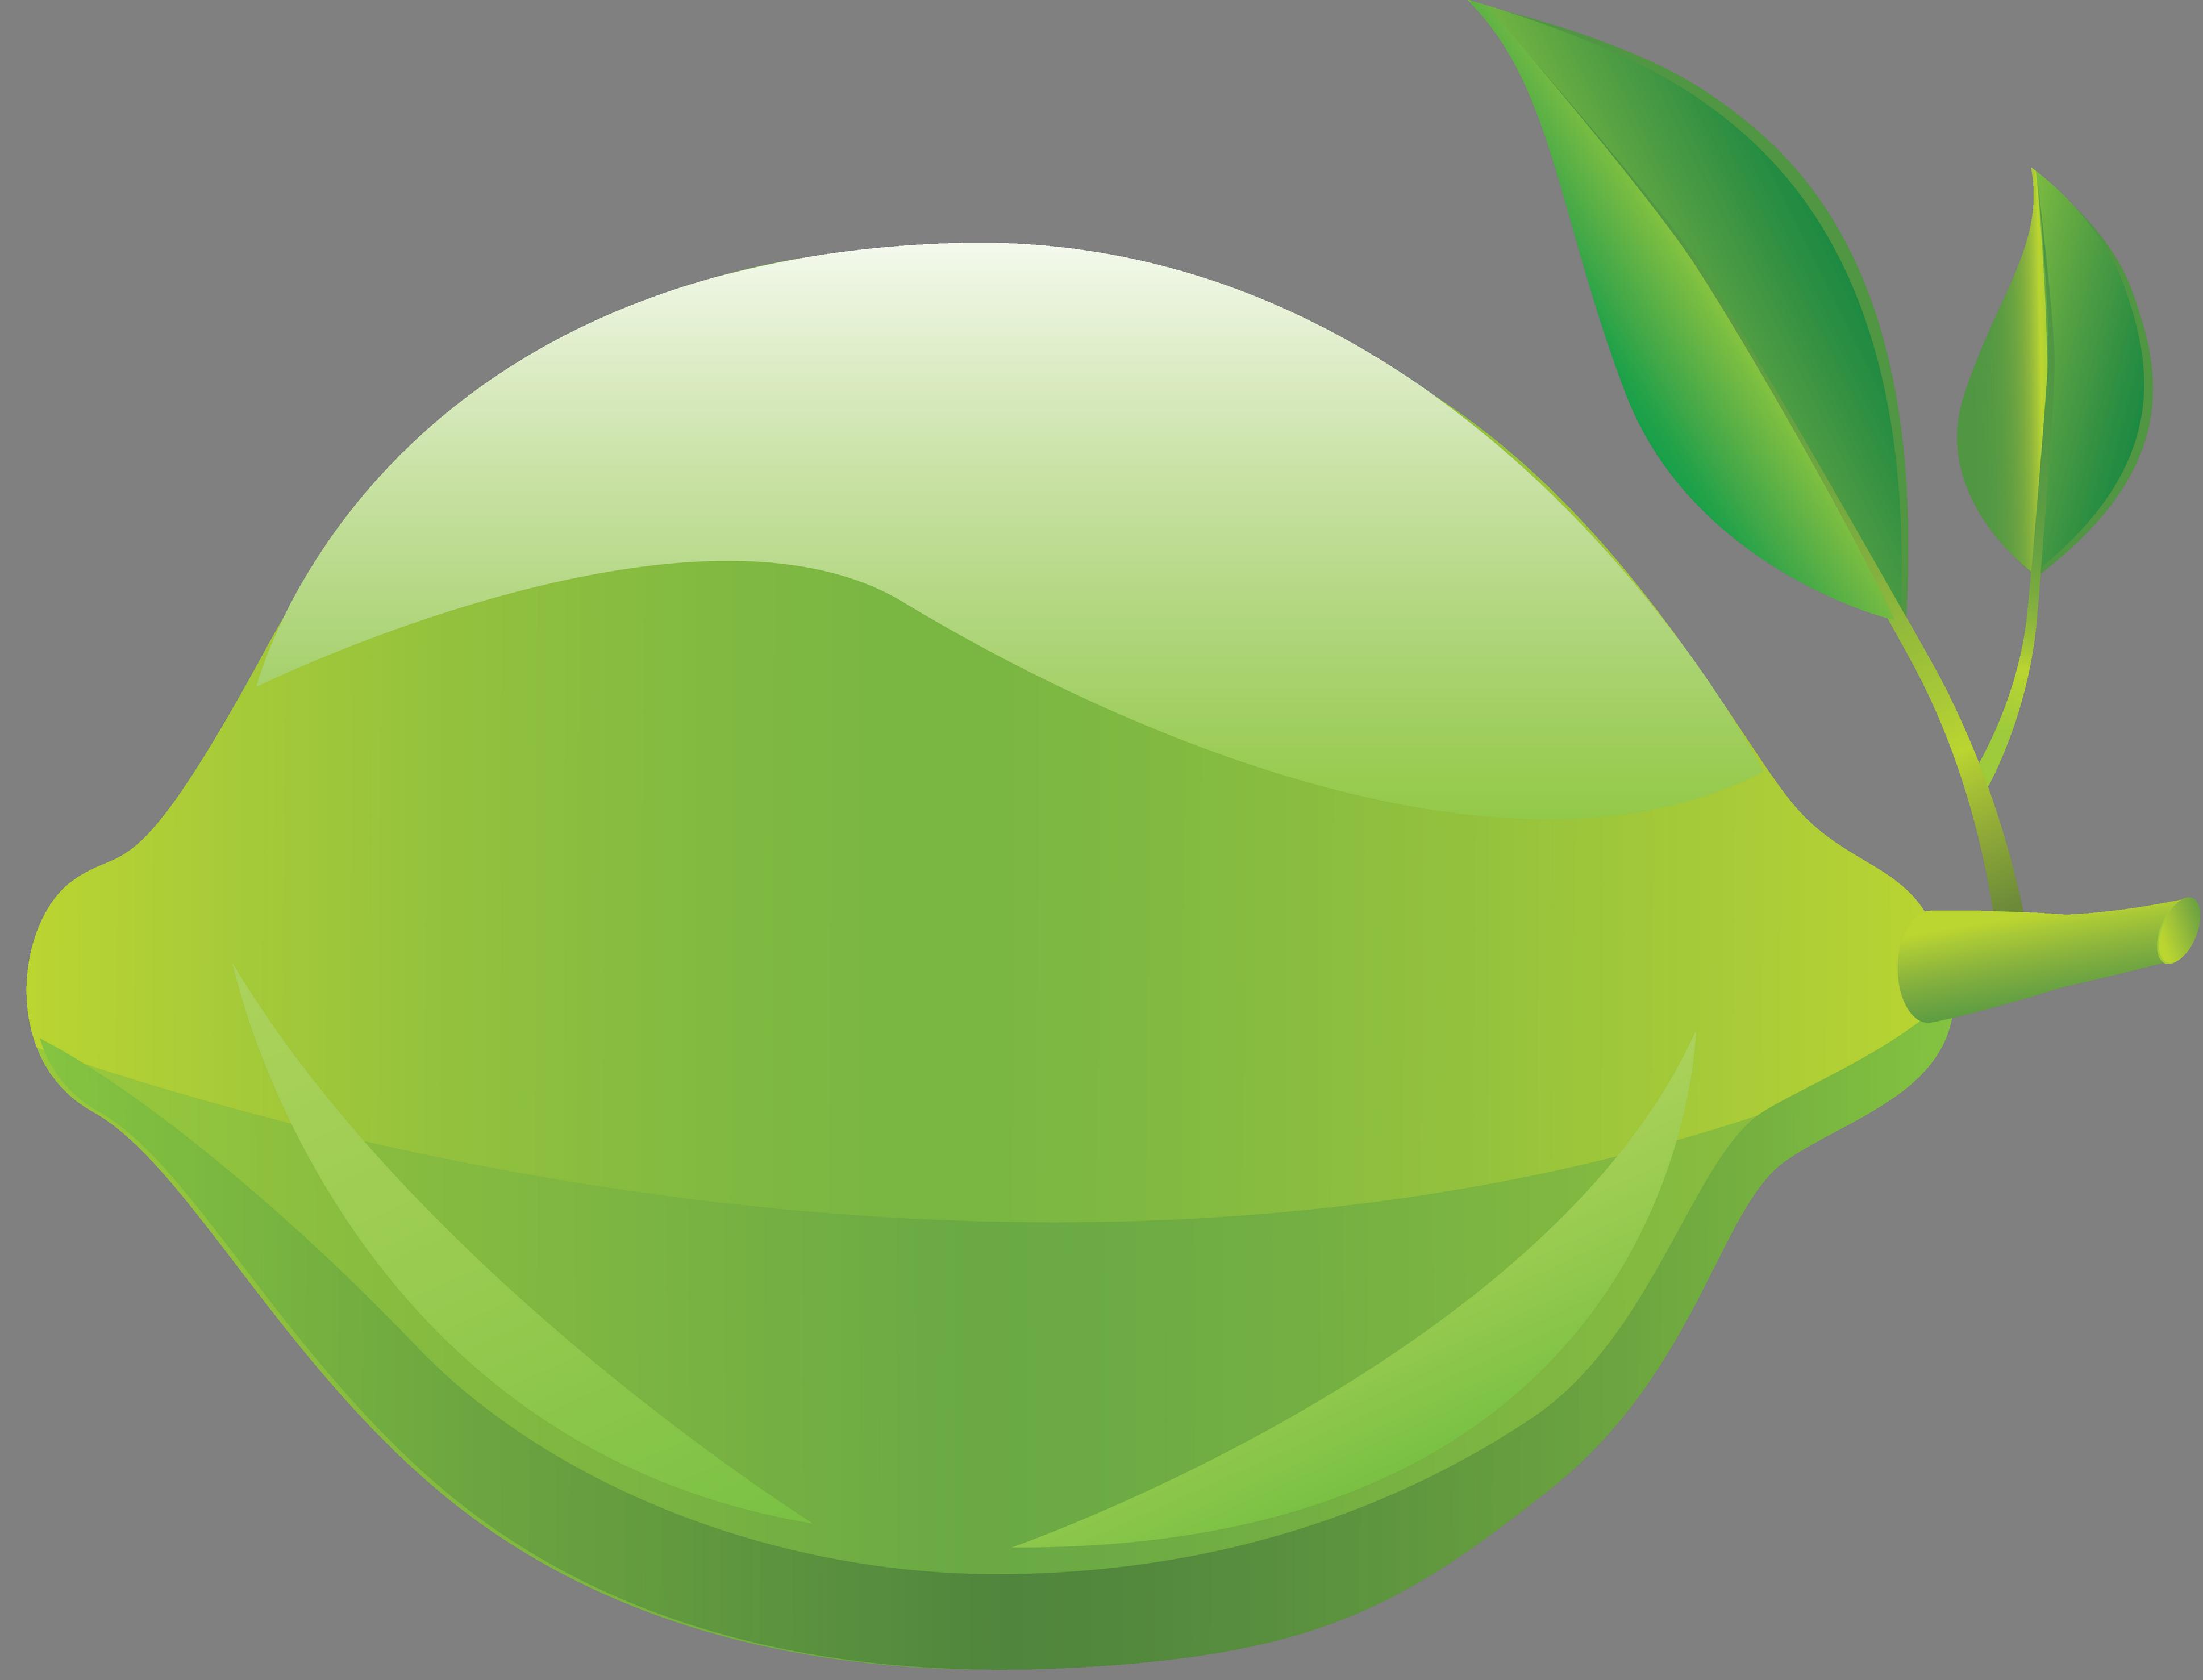 Lime PNG Image